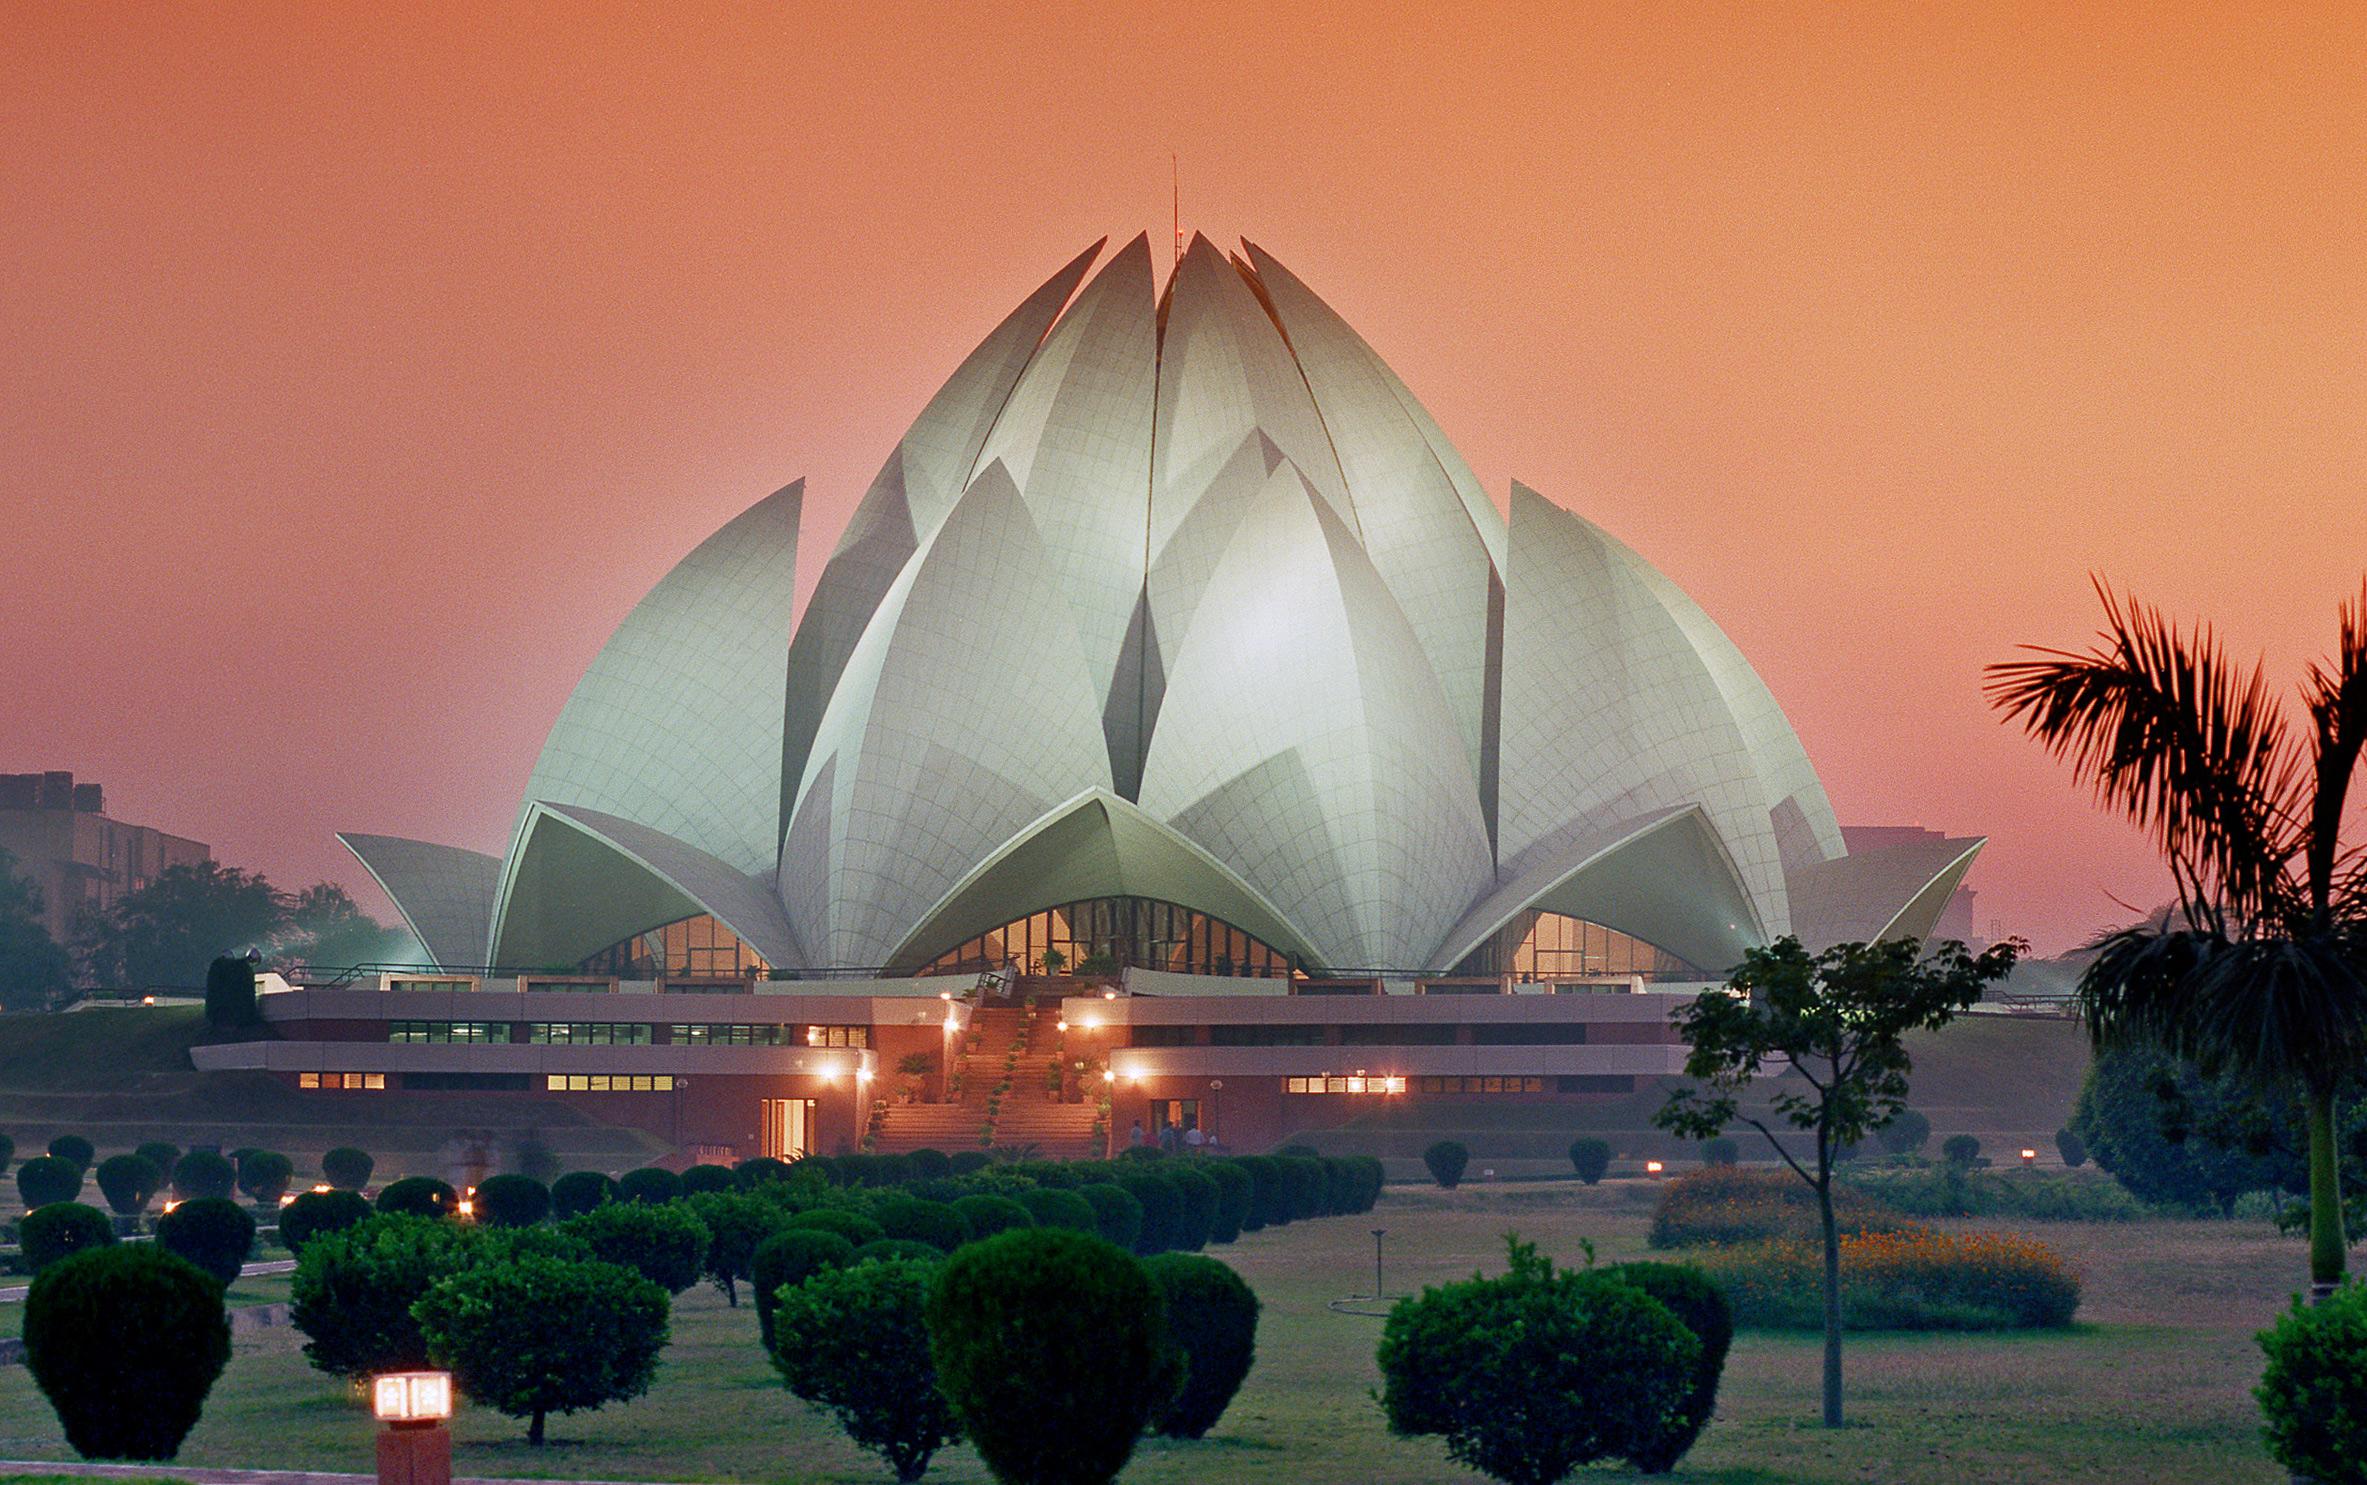 How to Reach Lotus Temple, Delhi